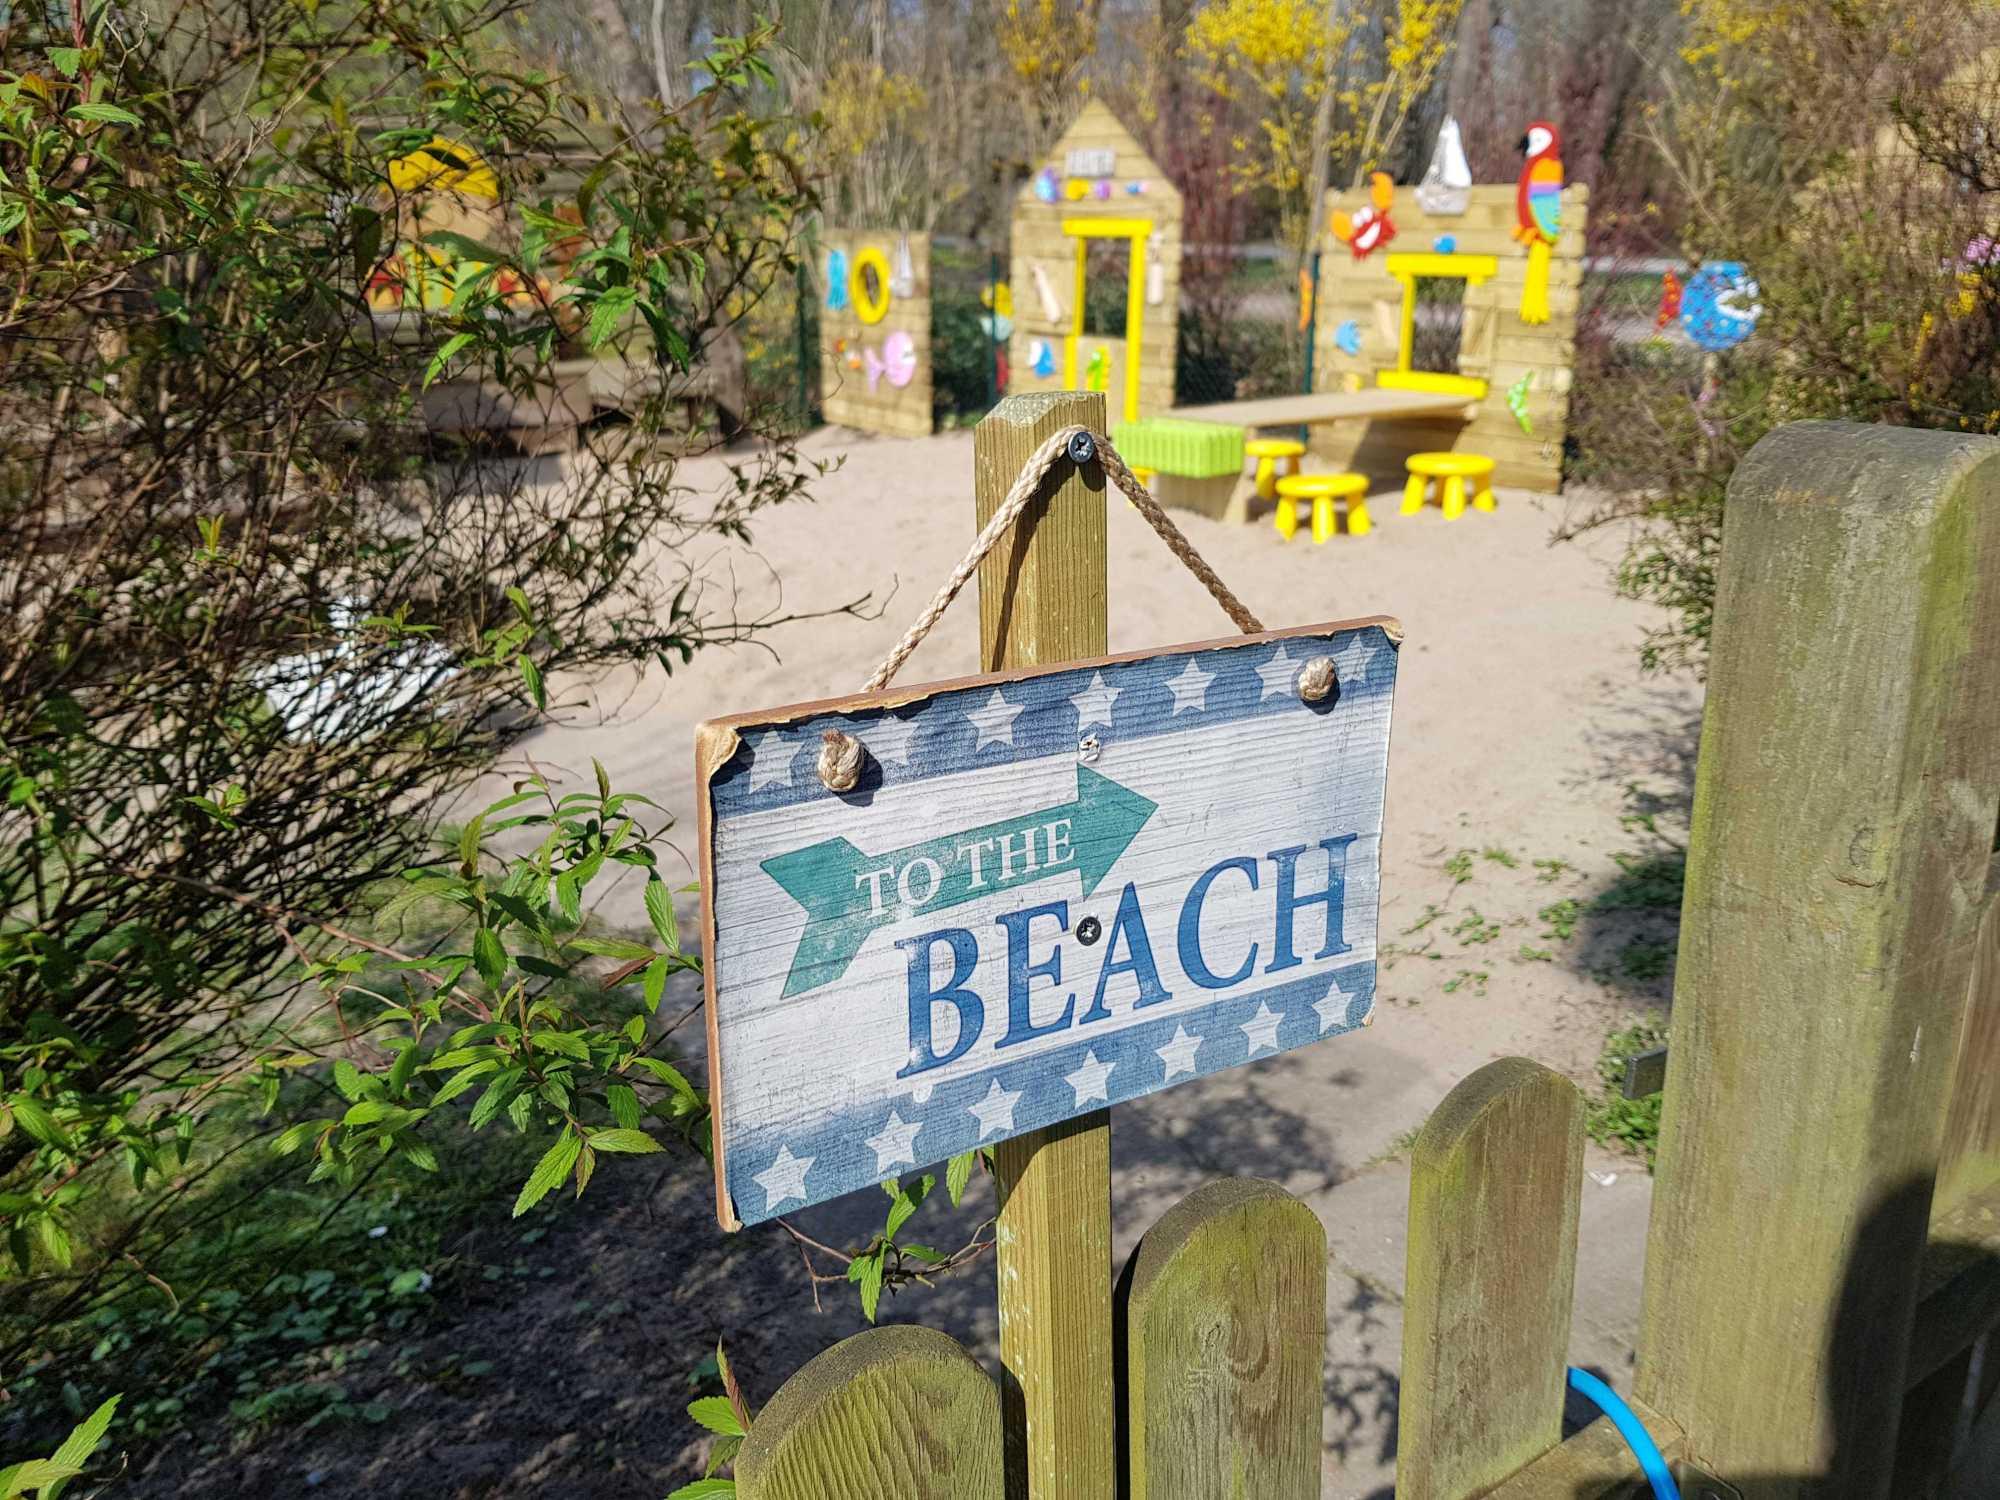 Kita Kid Zone Kinderbetreuung Garten1 19 - Kinder-Beachclub